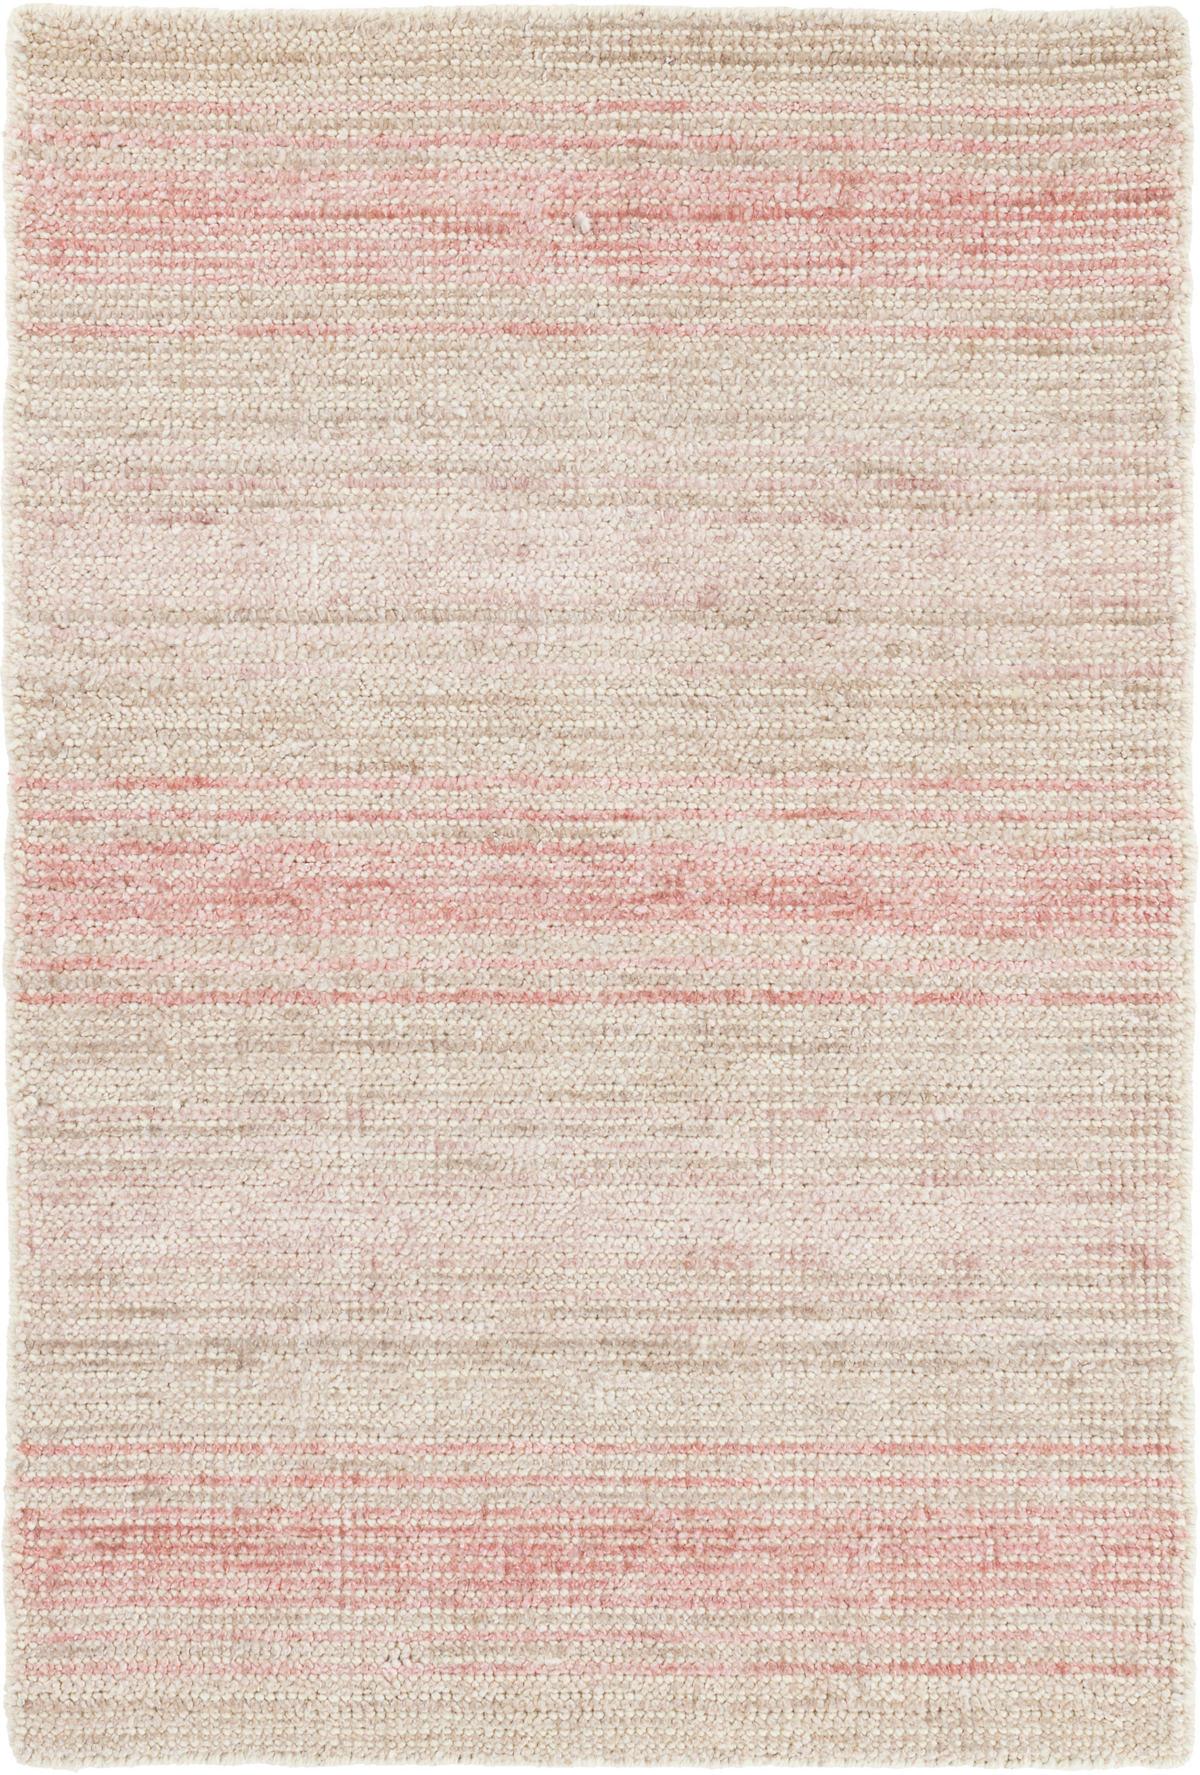 Aurora Woven Cotton/Viscose Rug